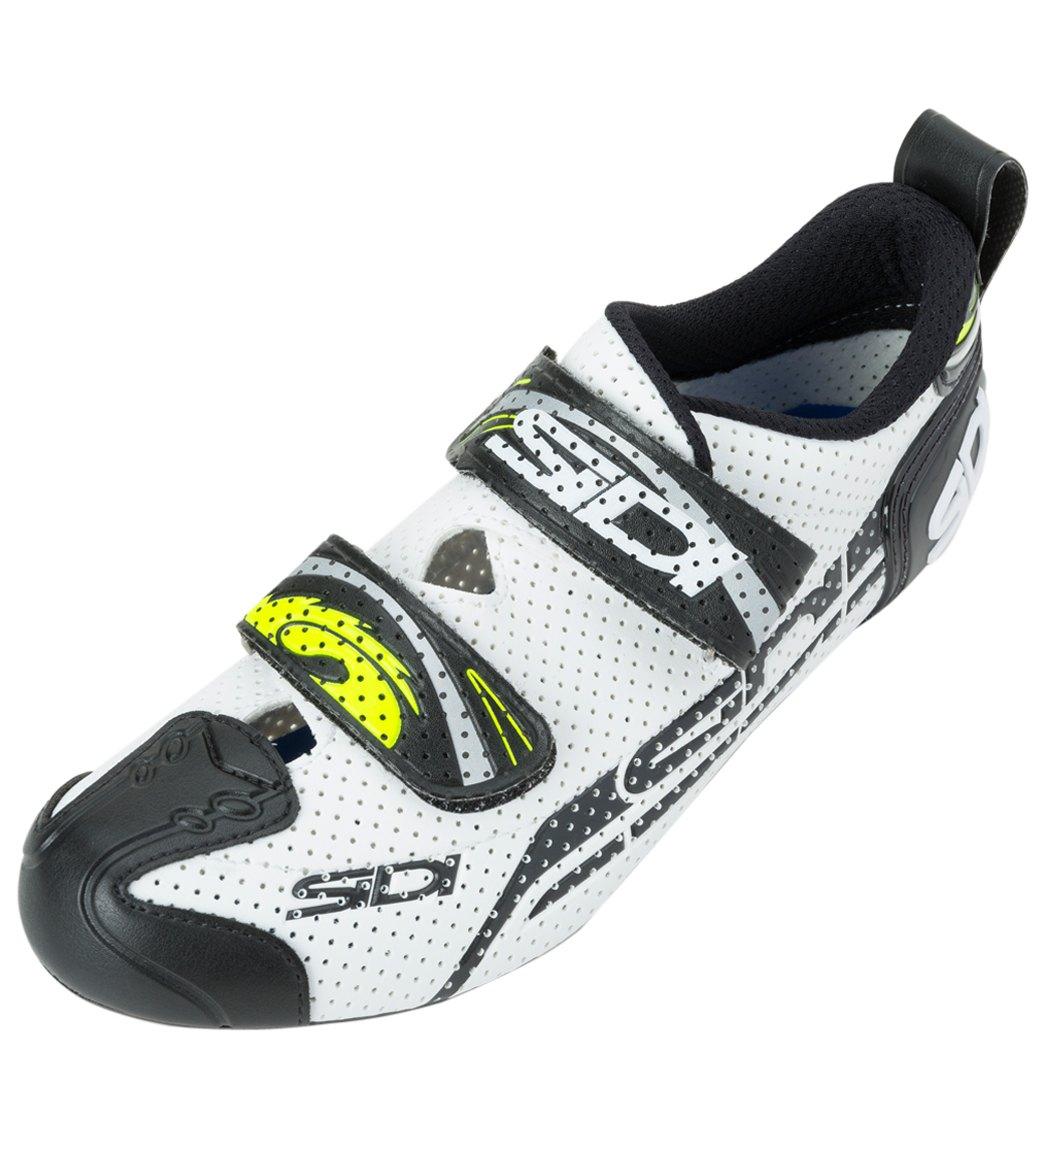 Sidi T Air Carbon Triathlon Shoe Review